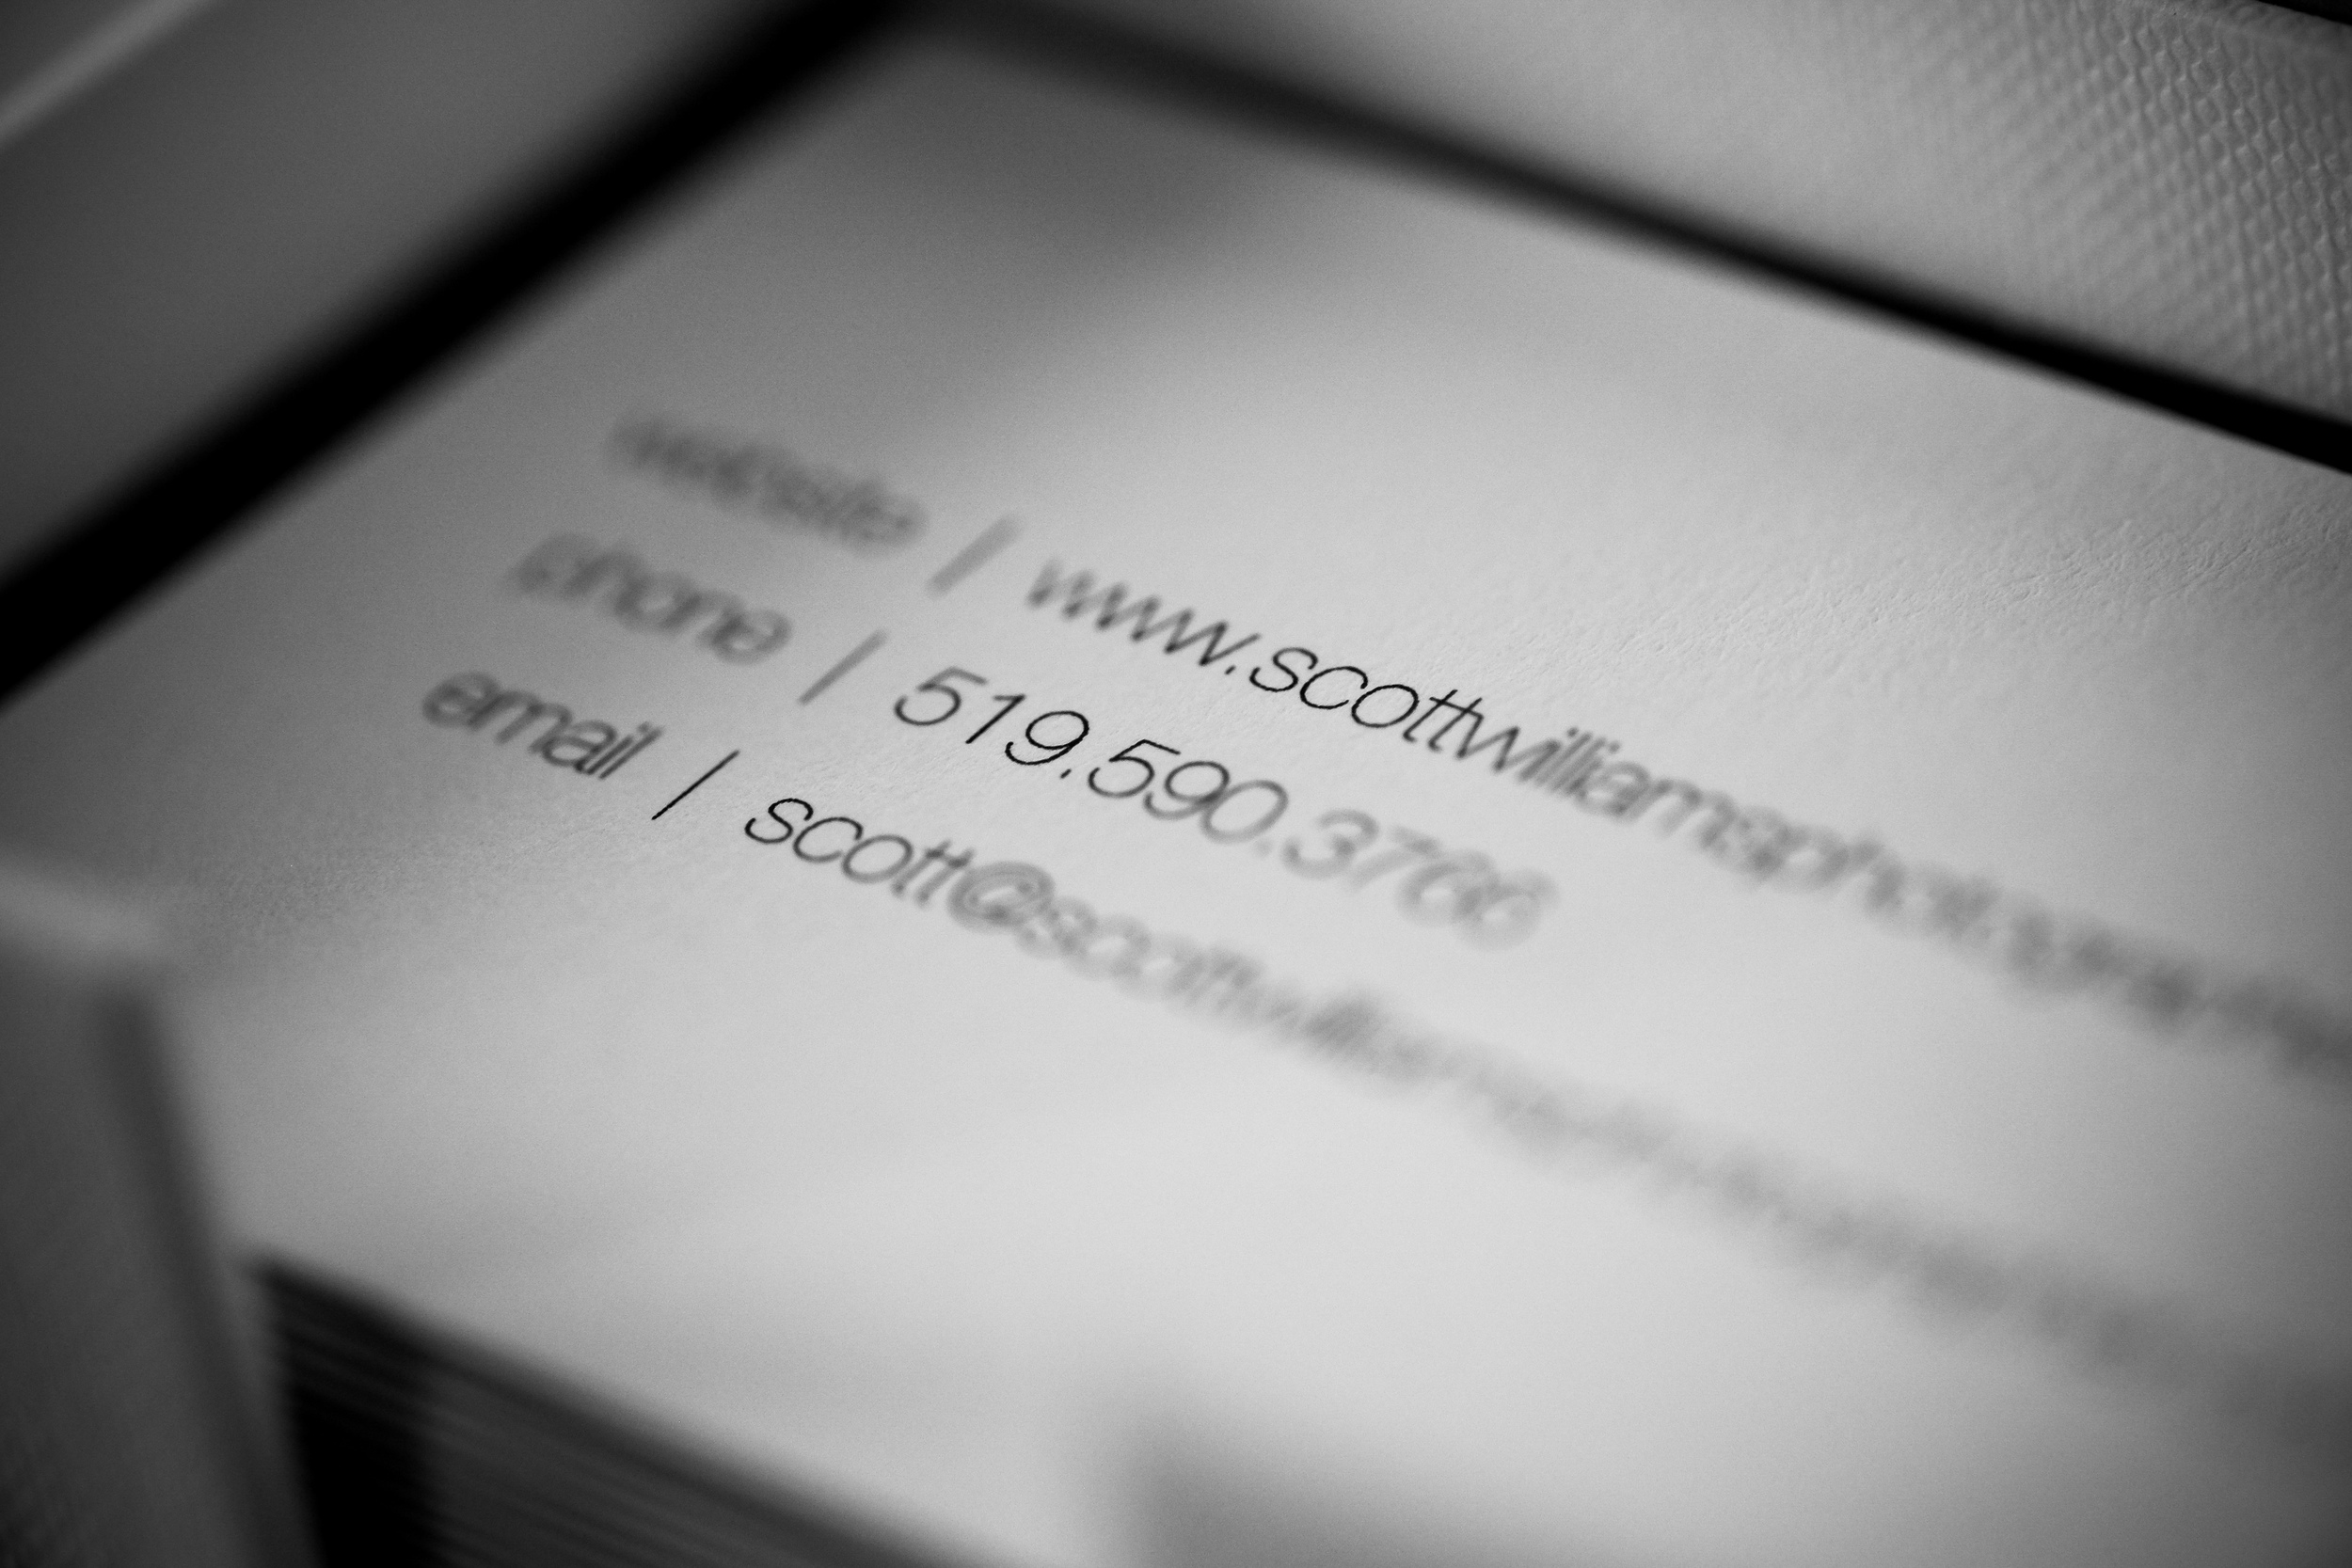 scott-williams-photographer-business-cards-003.jpg